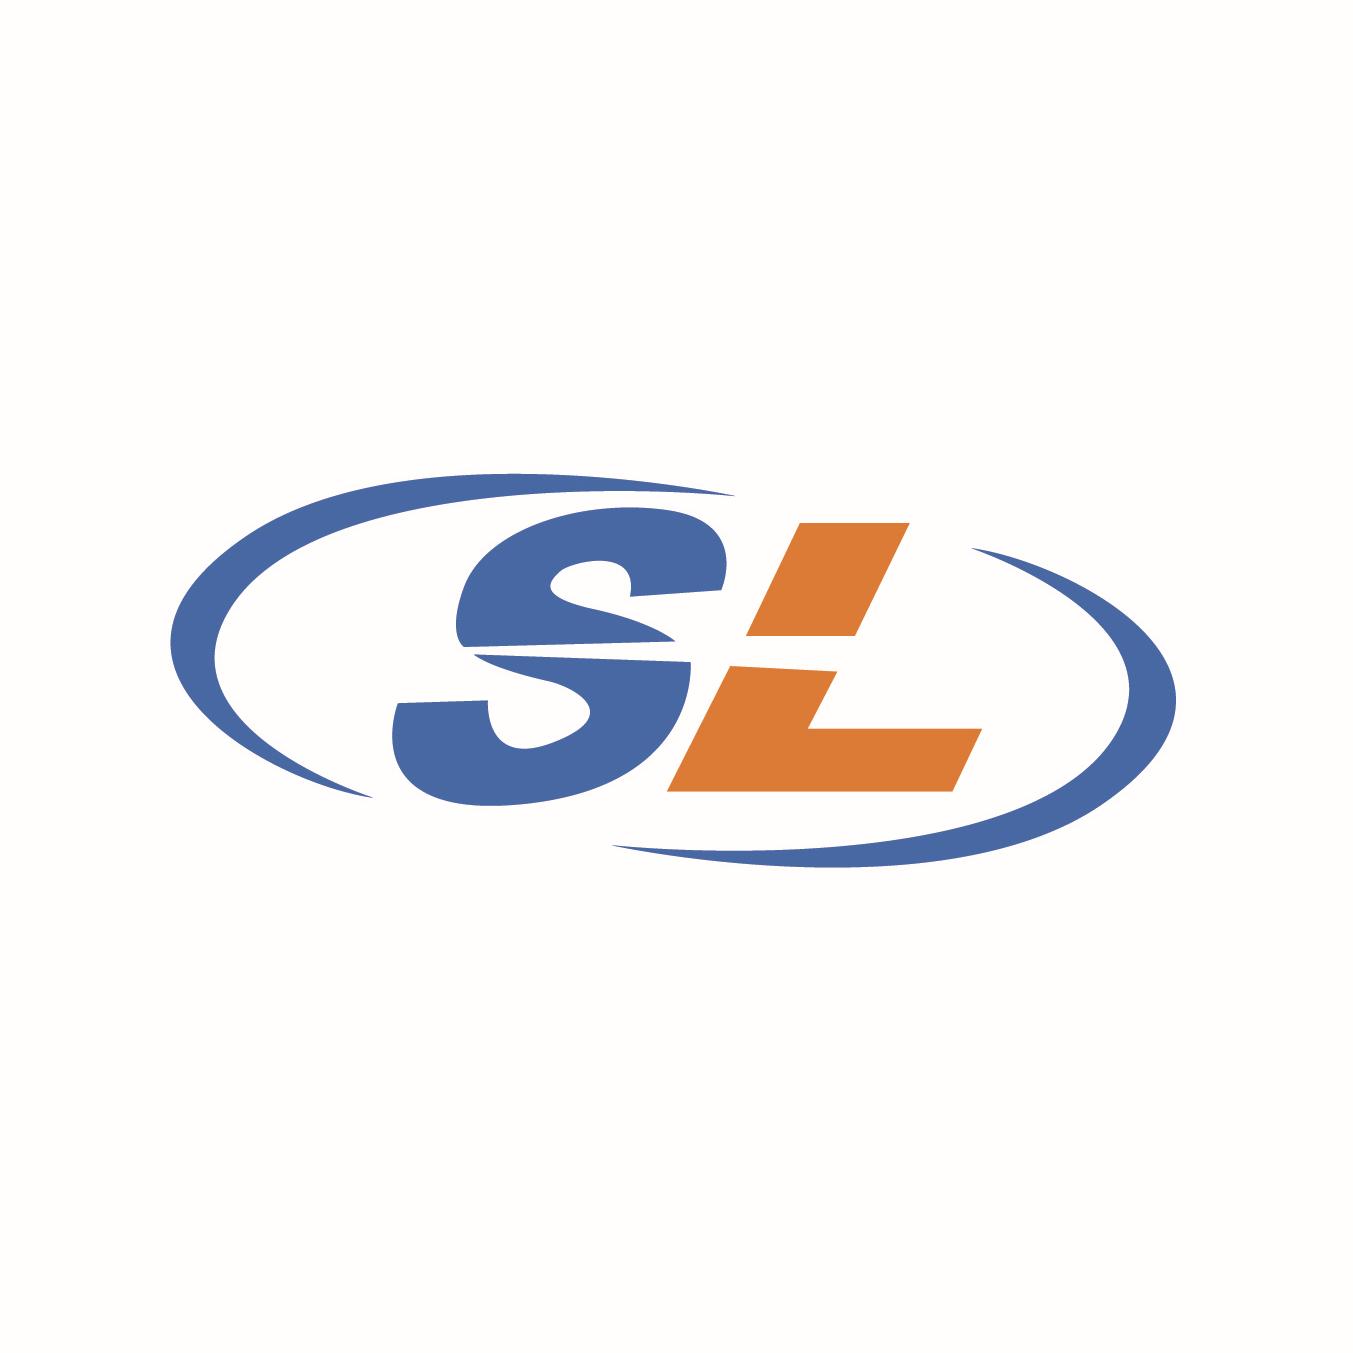 SHANGHAI SHUNLONG PHYSICAL THERAPY EQUIPMENT CO.,LTD